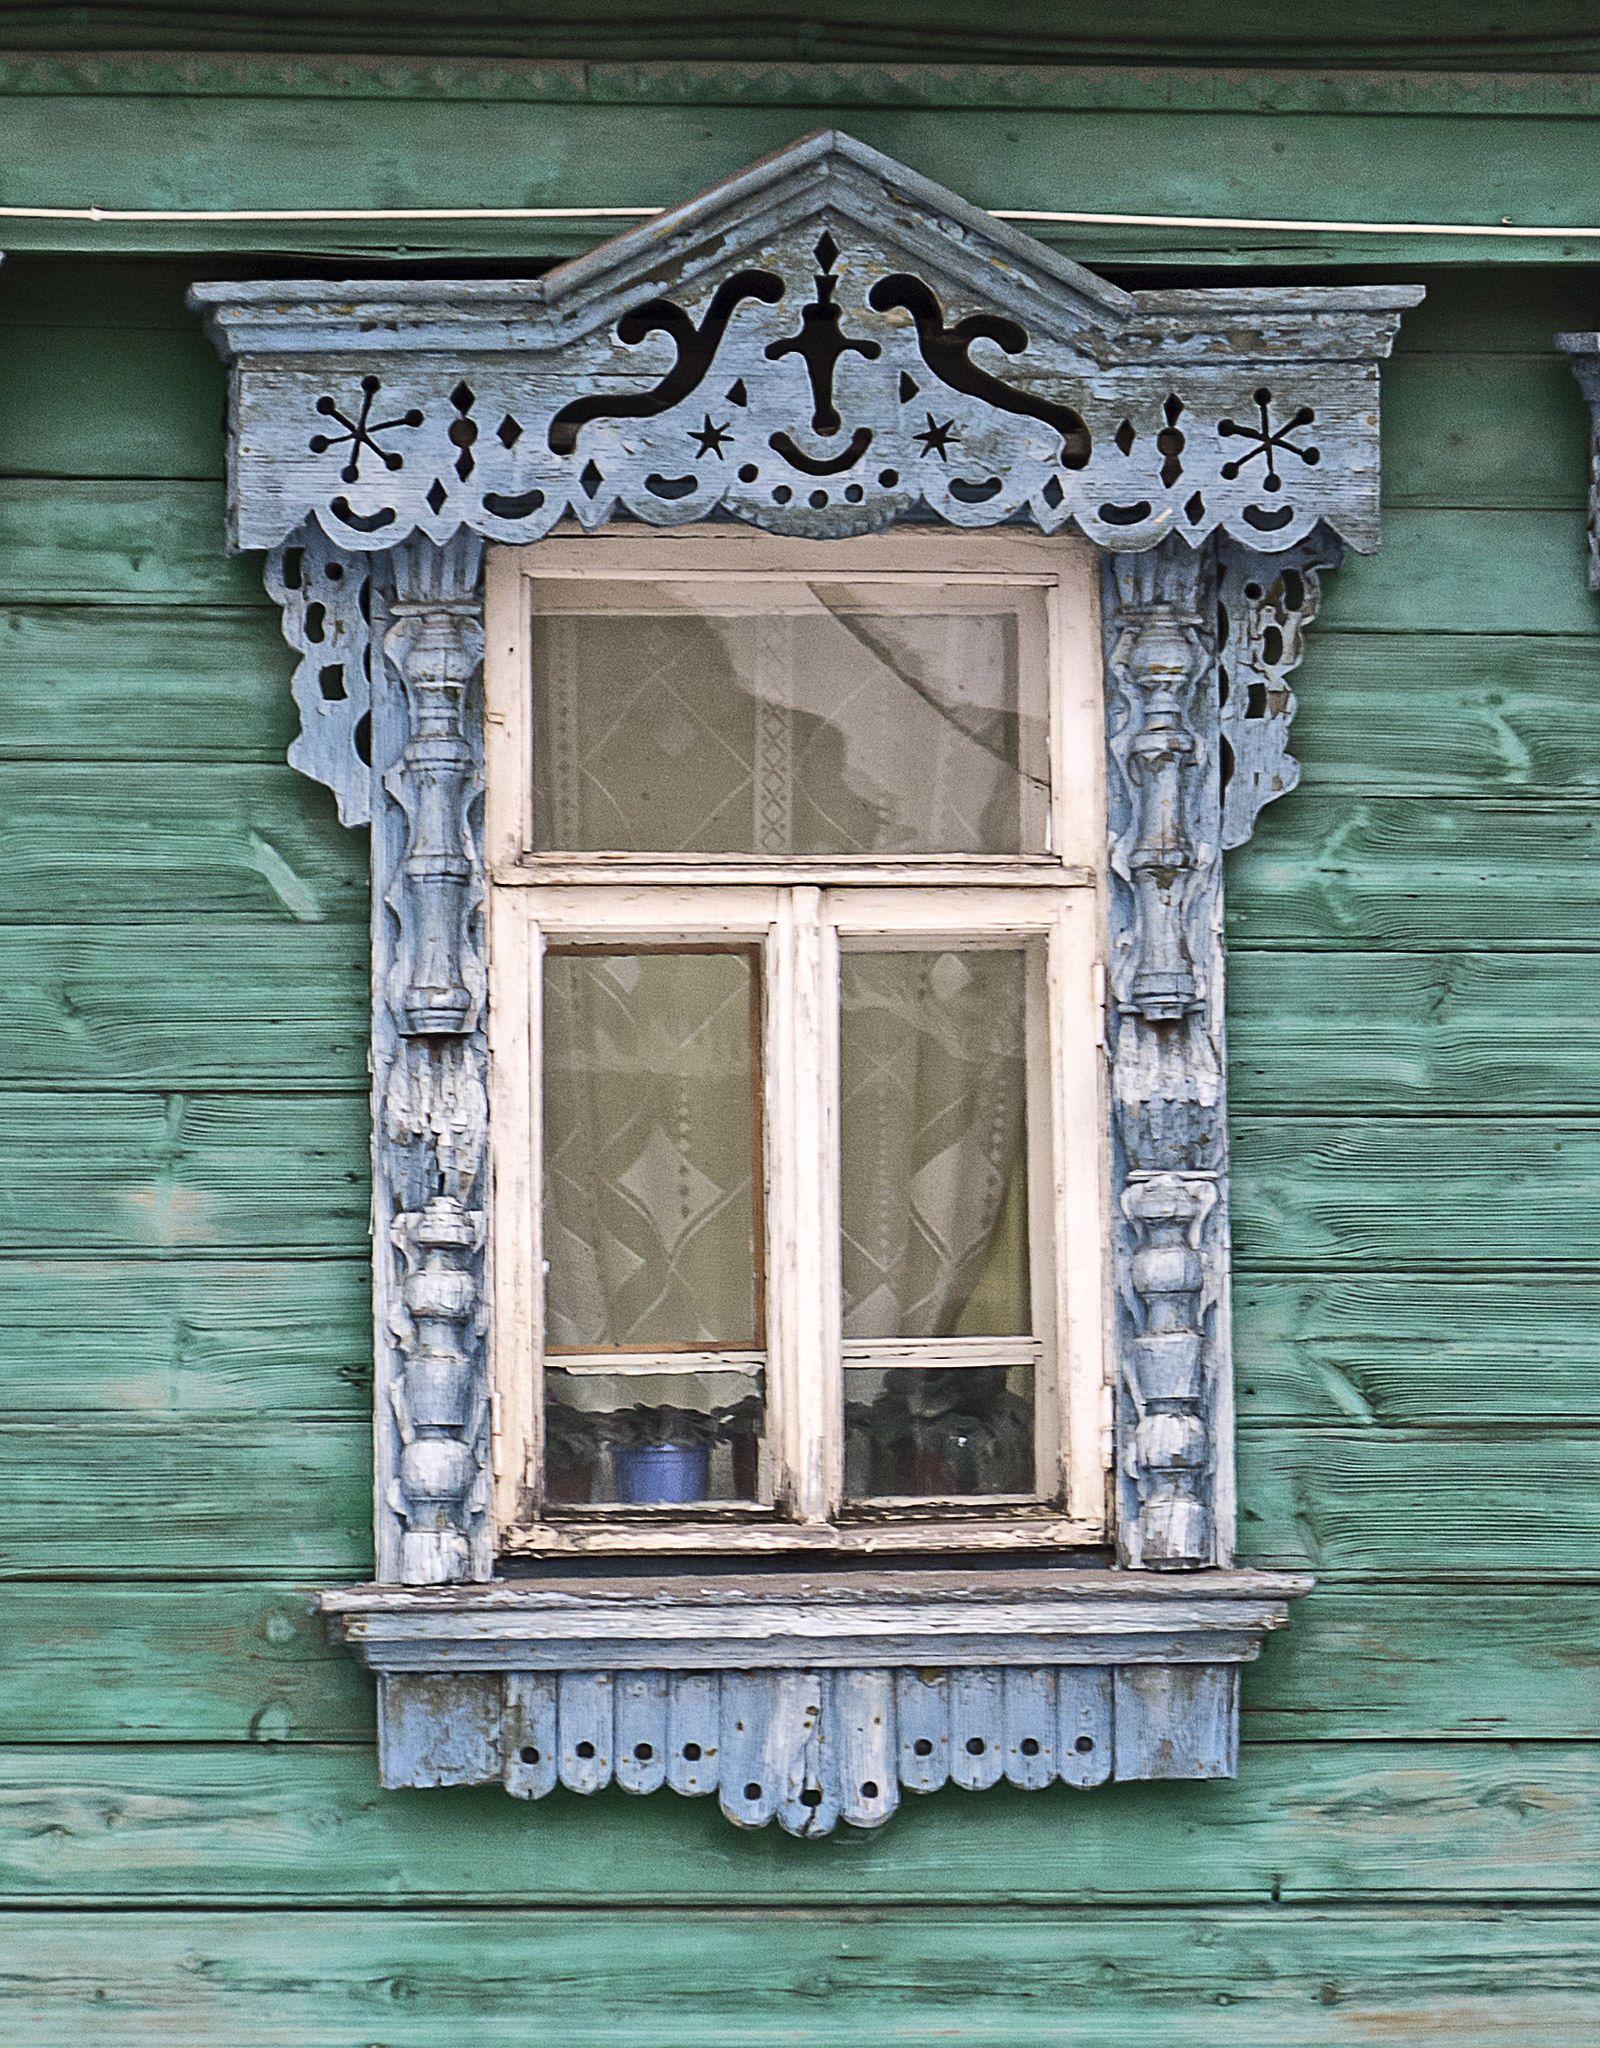 Муром. Наличники | Russian architecture and Architecture